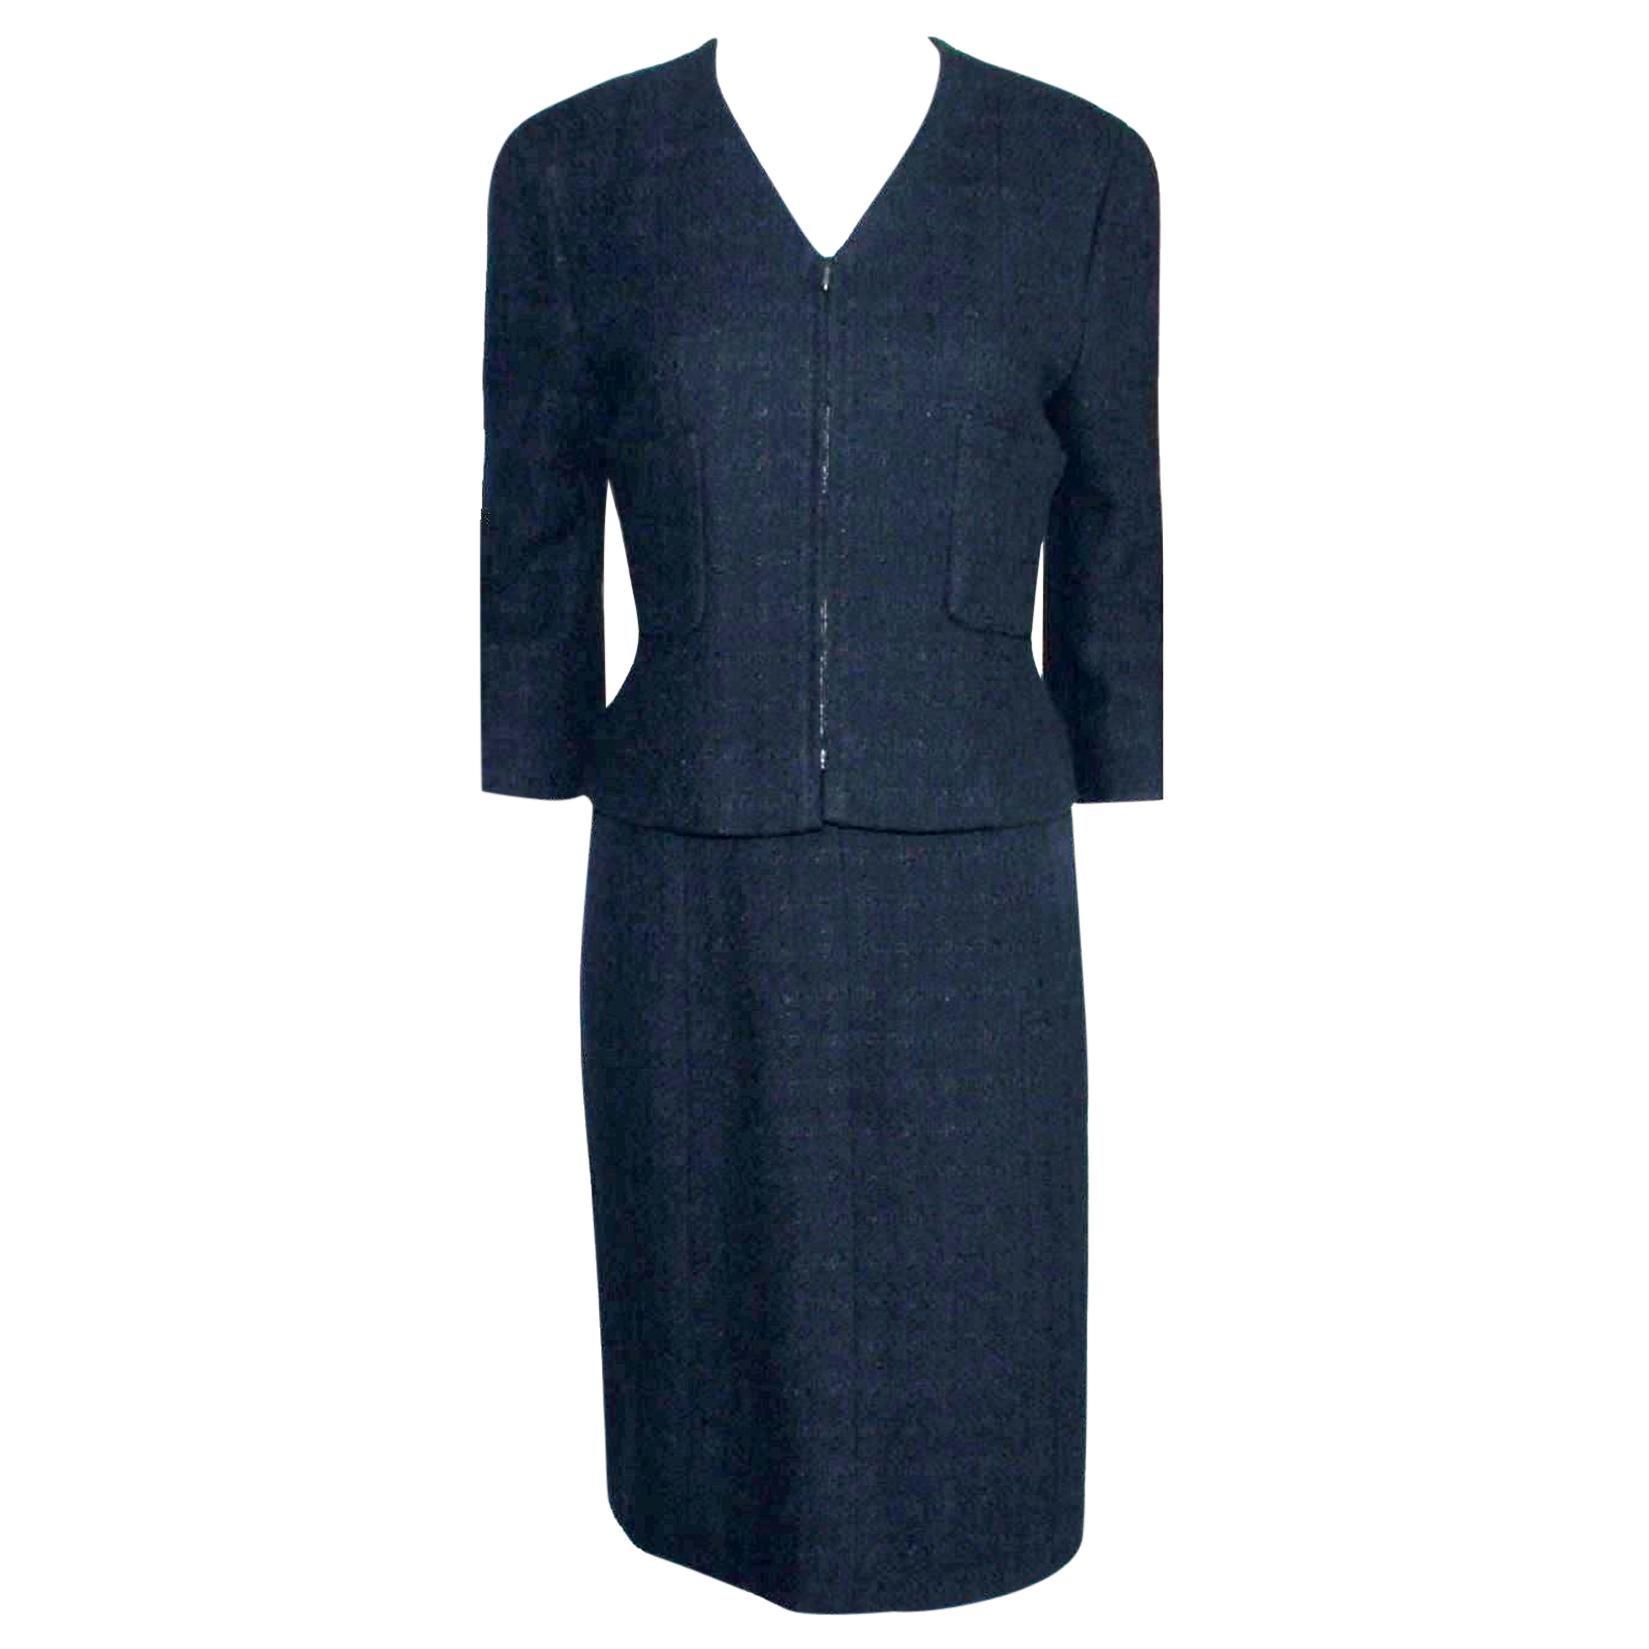 Chanel Midnight Blue Maison Lesage Tweed Jacket Skirt Suit